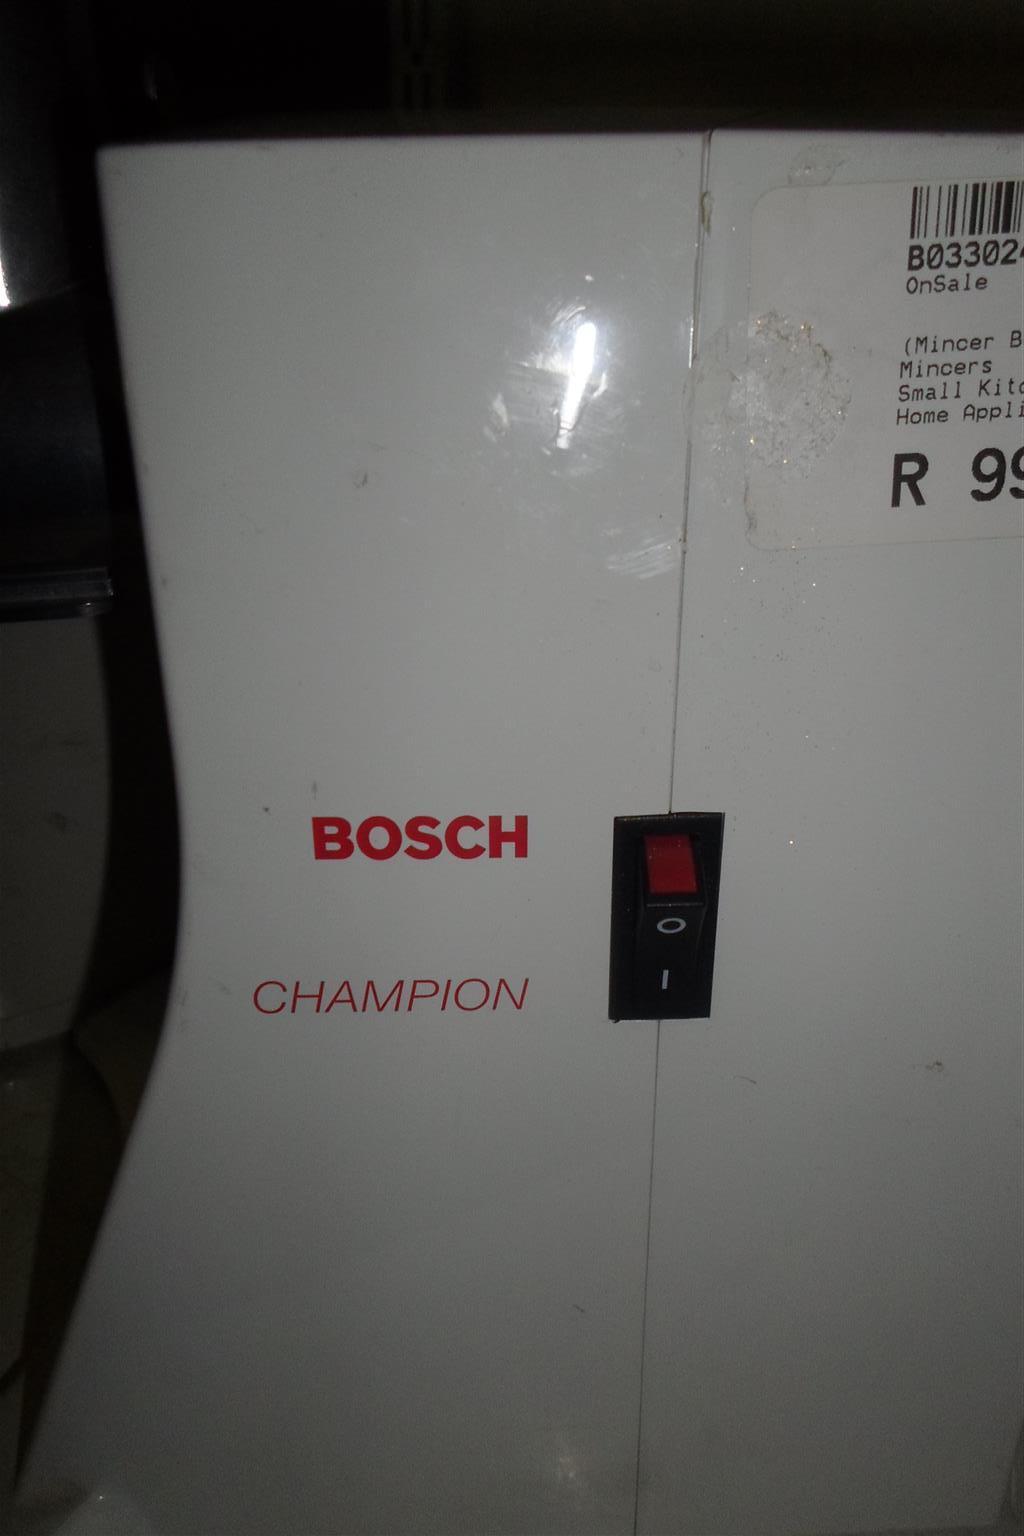 Bosch Champion Mincer - B033024057-1